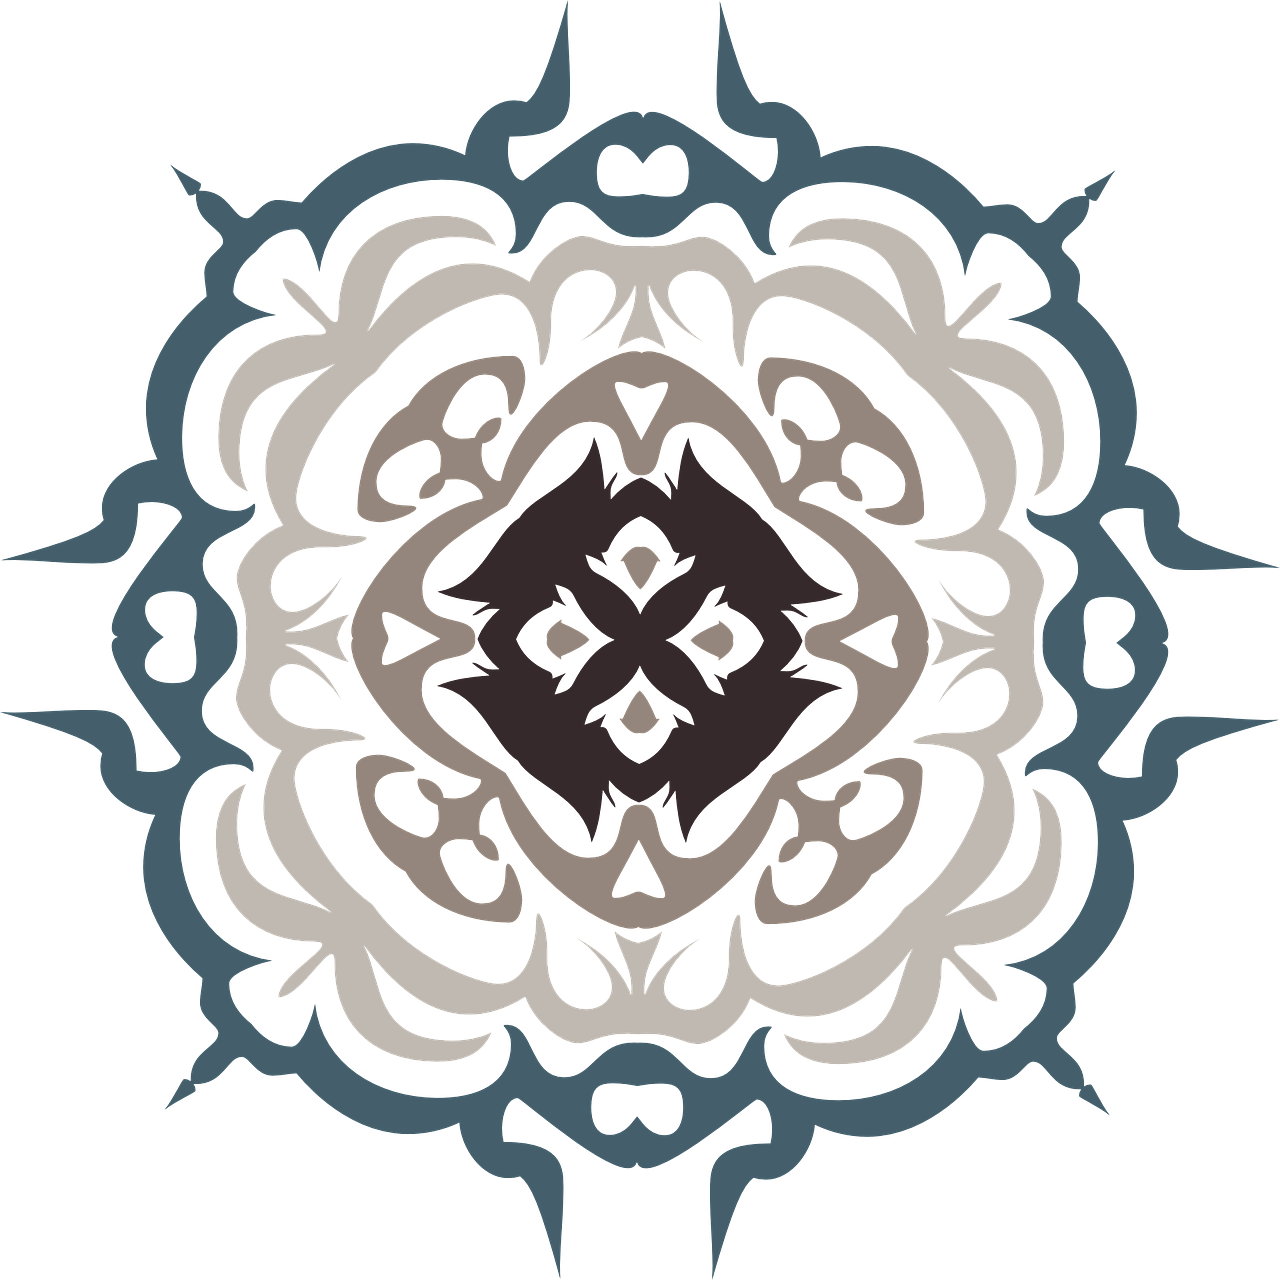 Flourish clipart red damask. Decorative ornate transparent image